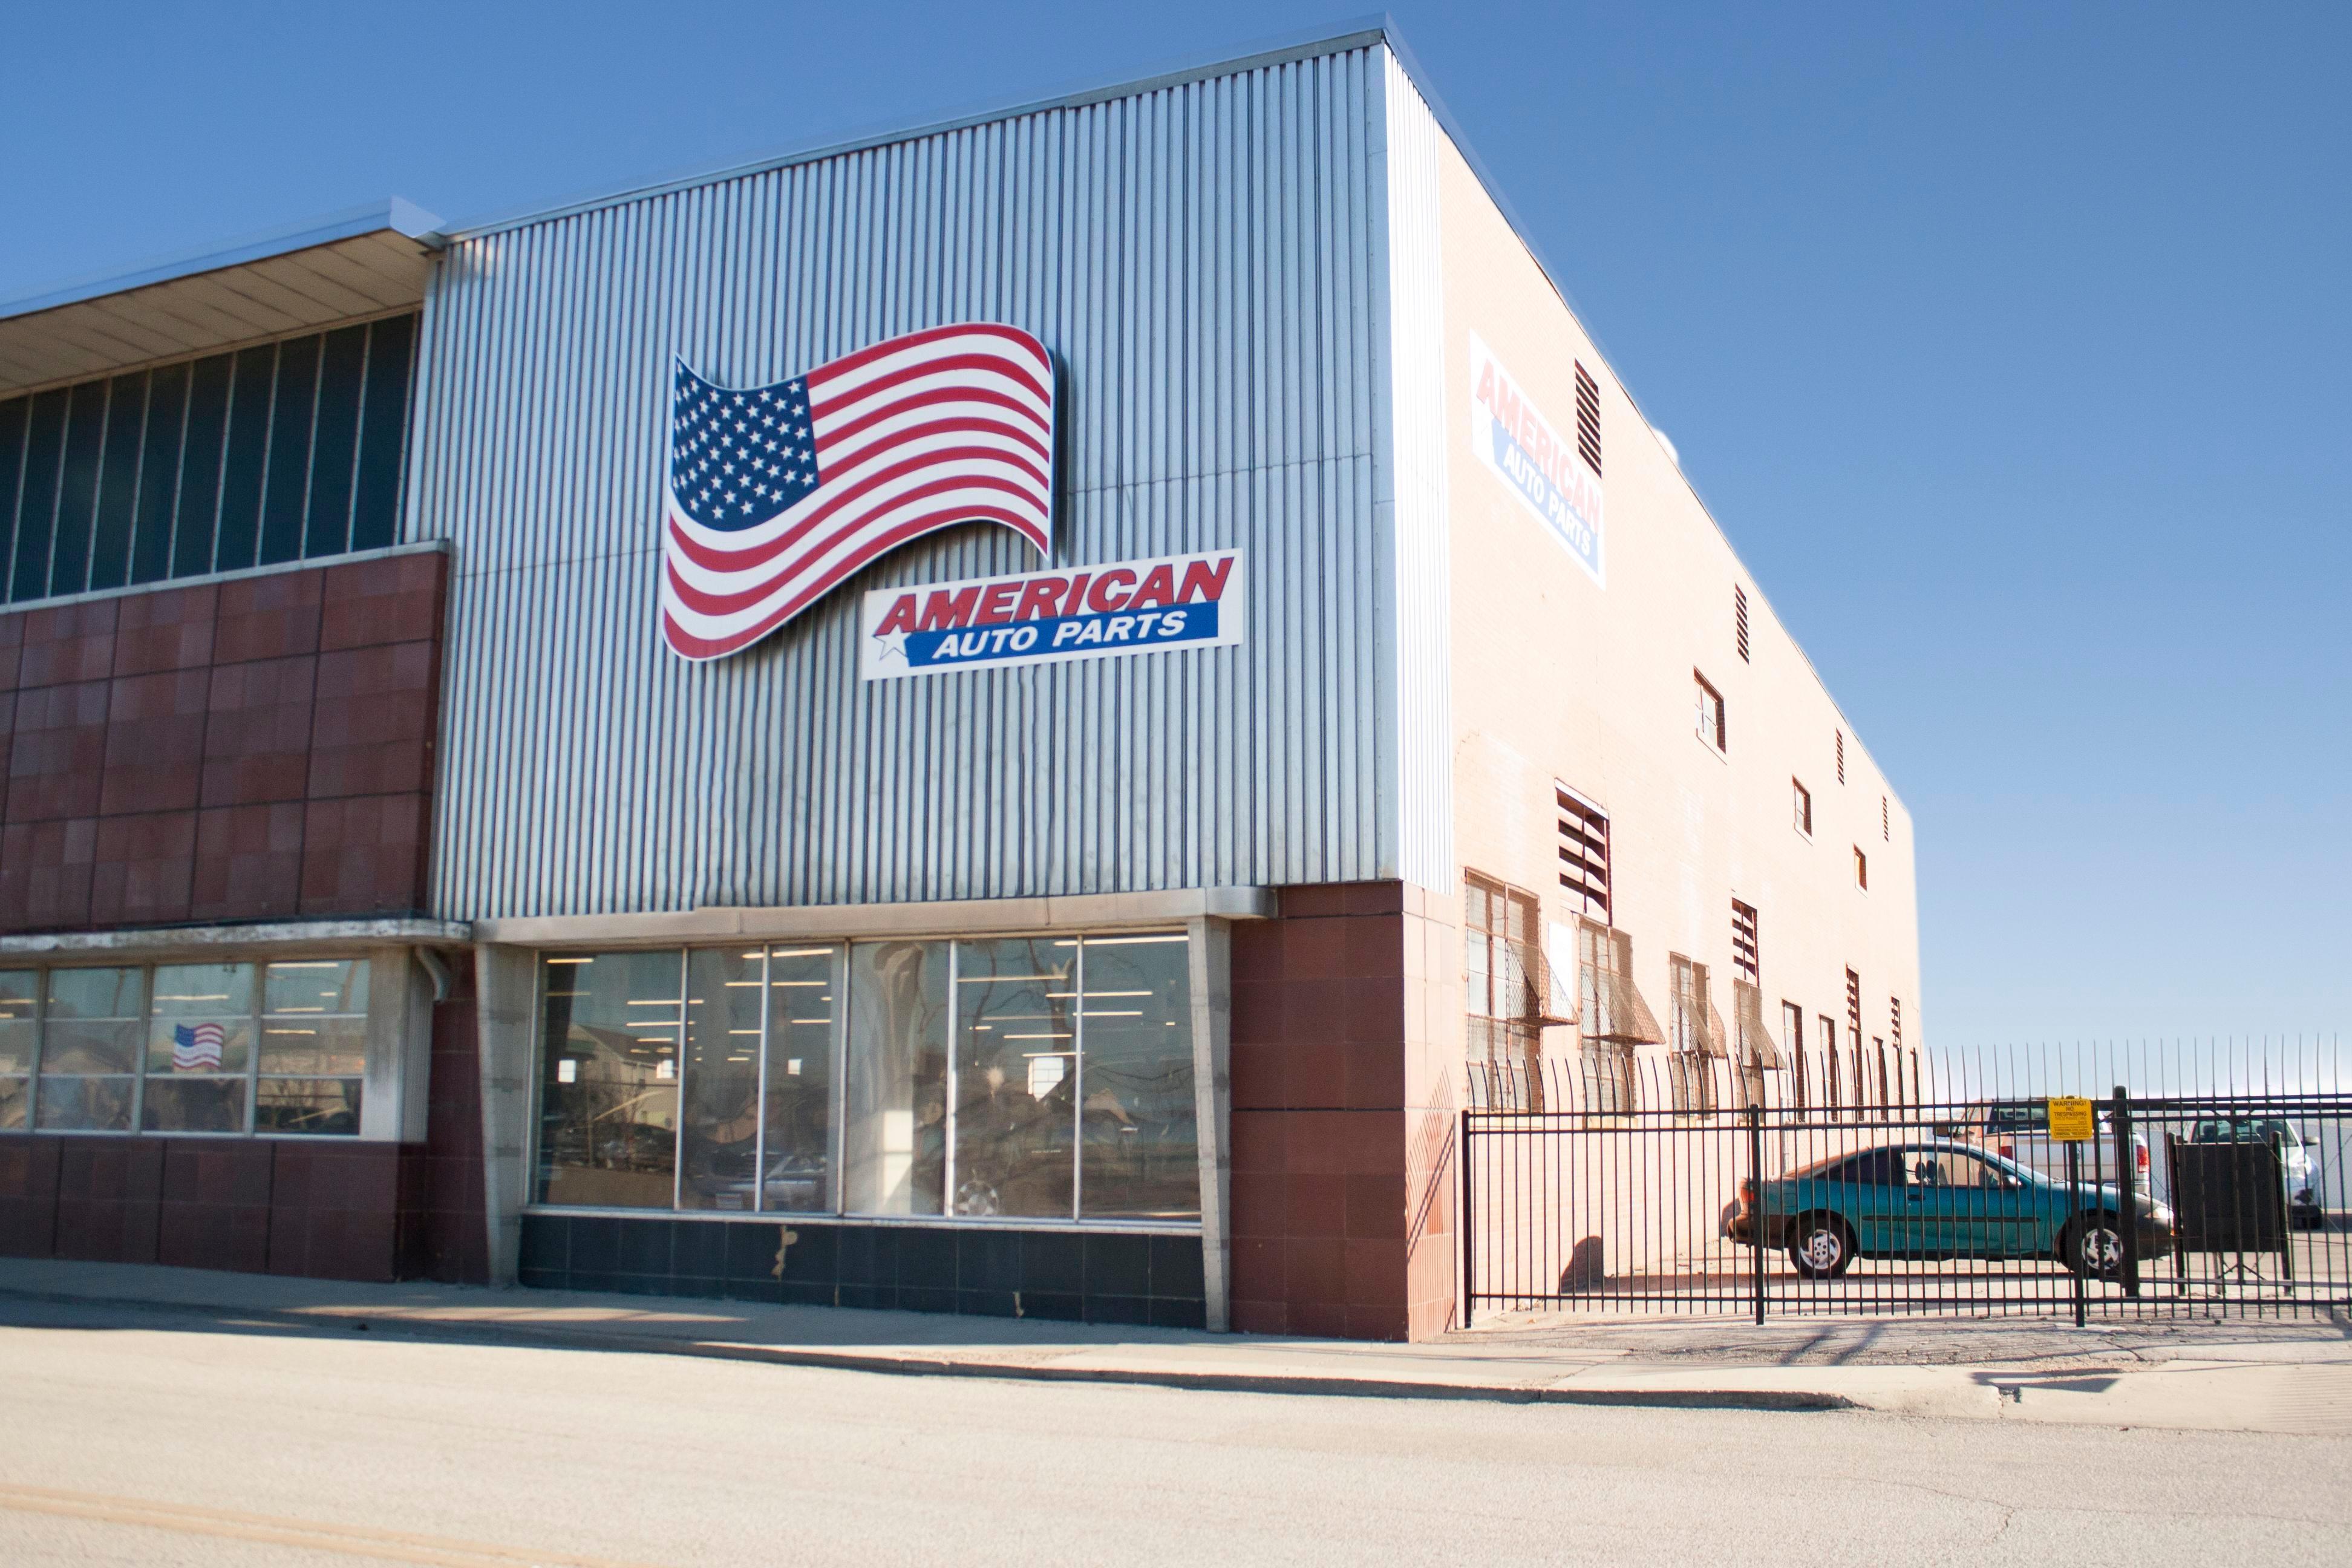 Jeep Dealers Omaha >> American Auto Parts in Omaha, NE 68110 - ChamberofCommerce.com